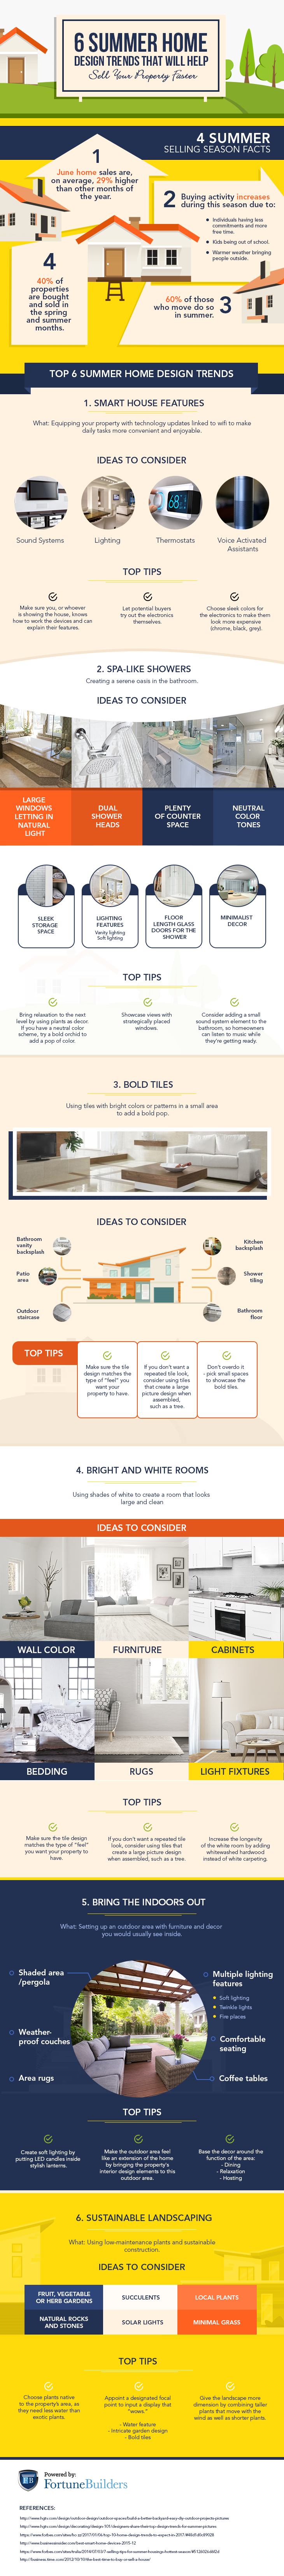 Summer real estate trends